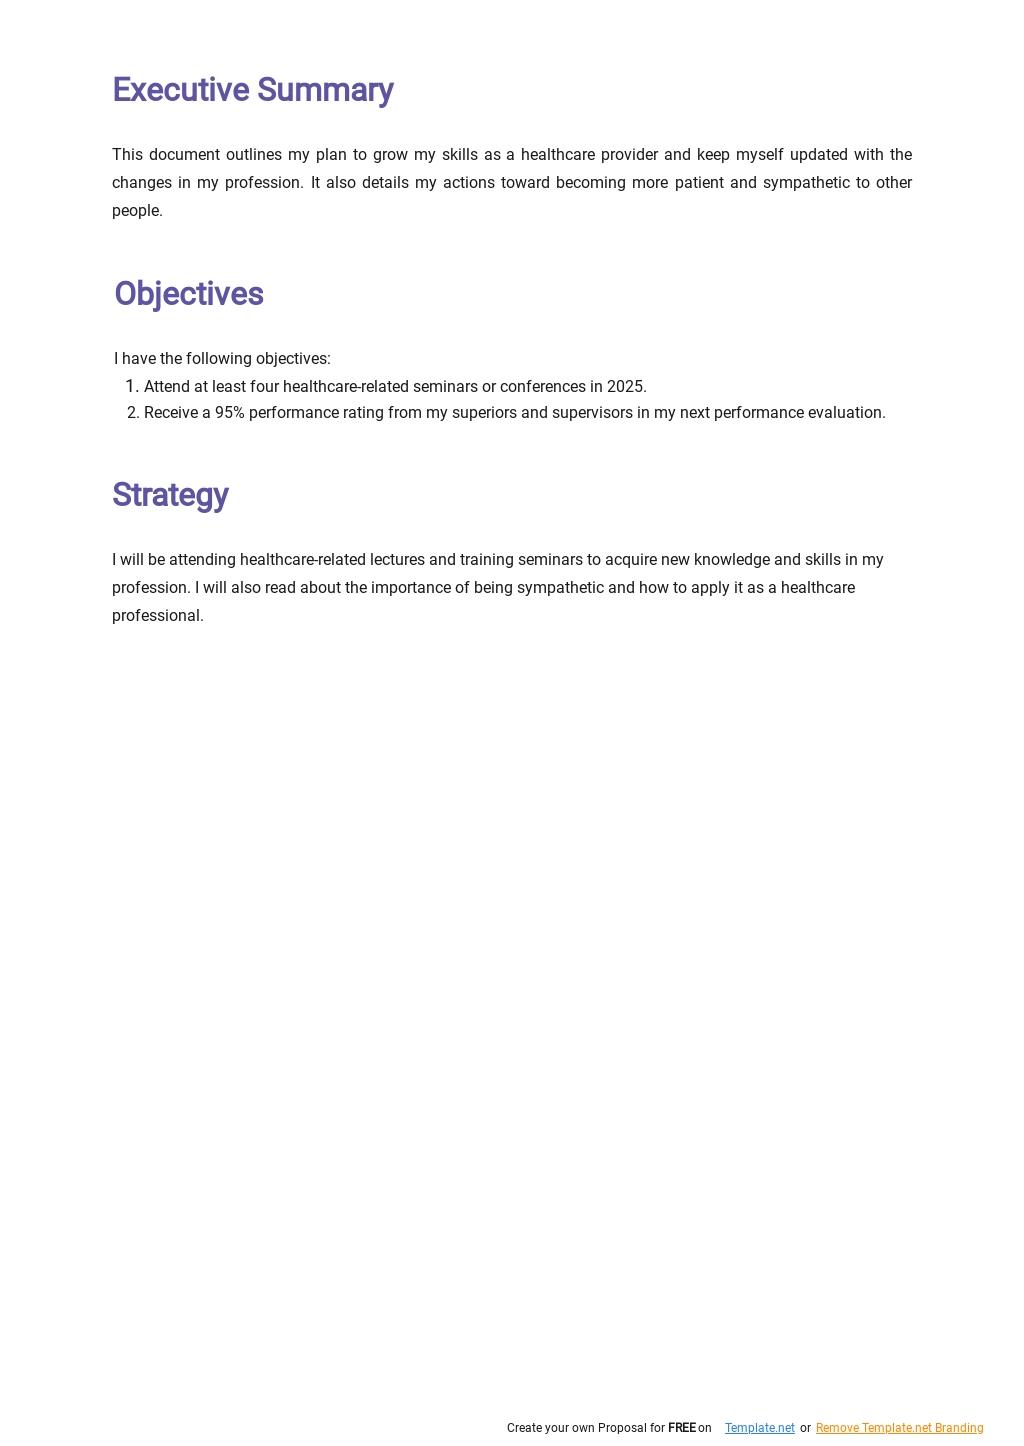 Personal Strategic Plan Template 1.jpe